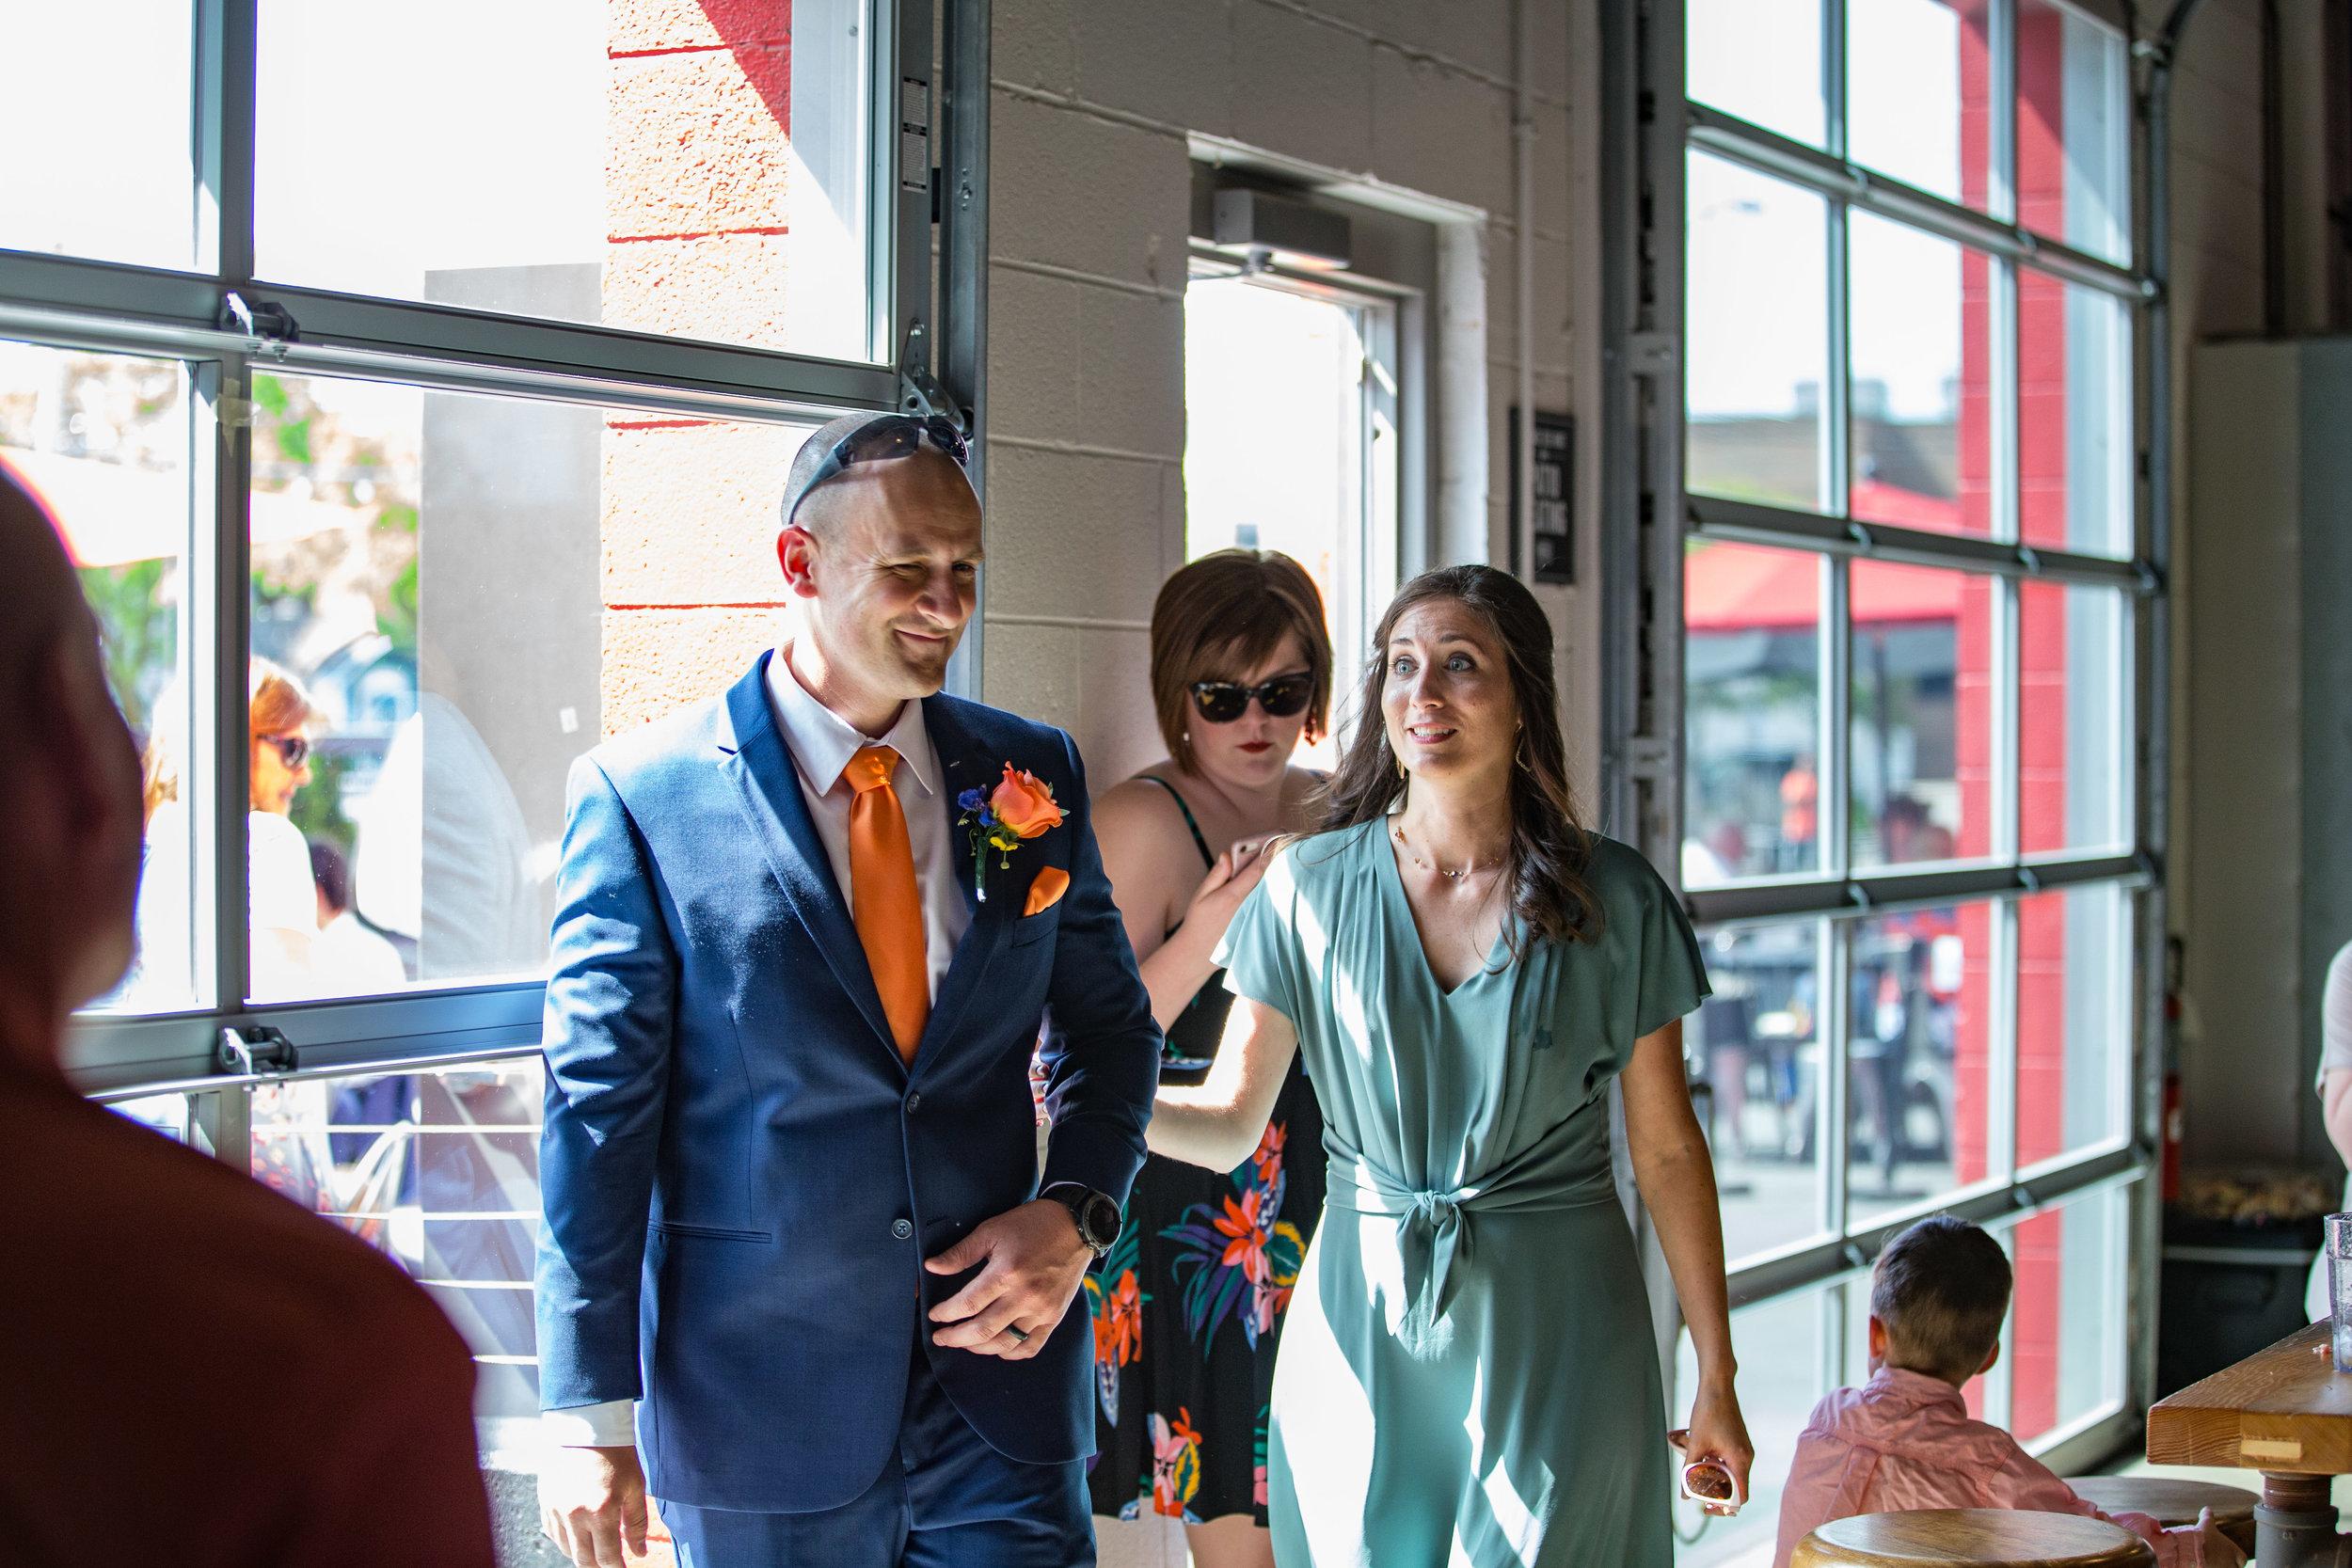 Natalie and Dallas Mooney Wedding 6-8-19_Tania Watt Photography-403.jpg